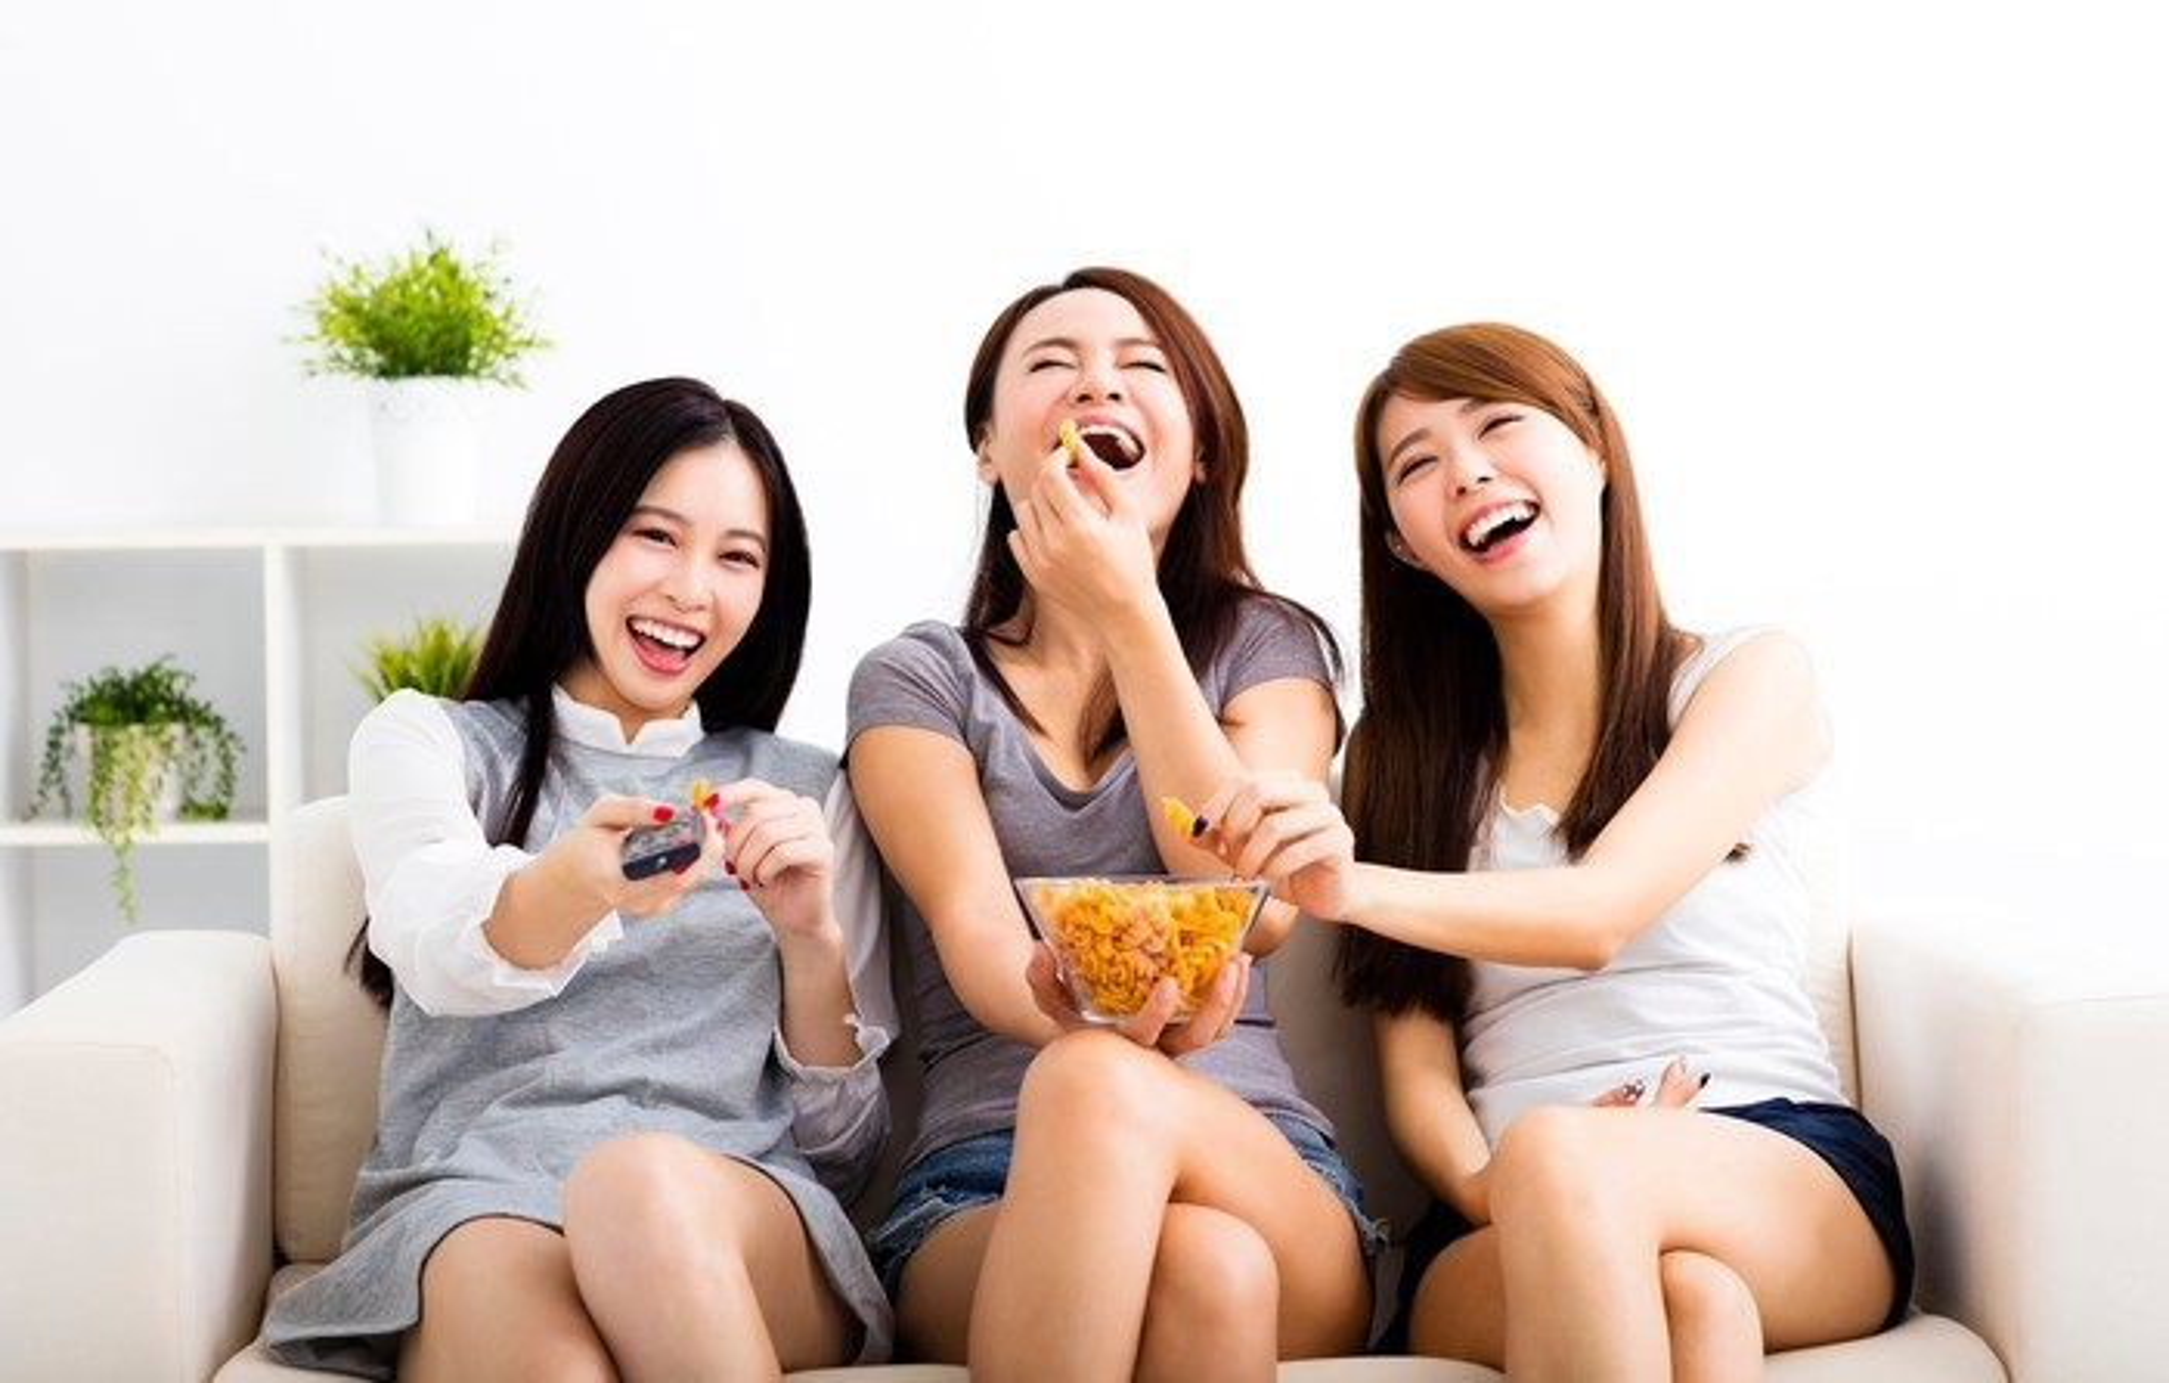 Three women watch TV.